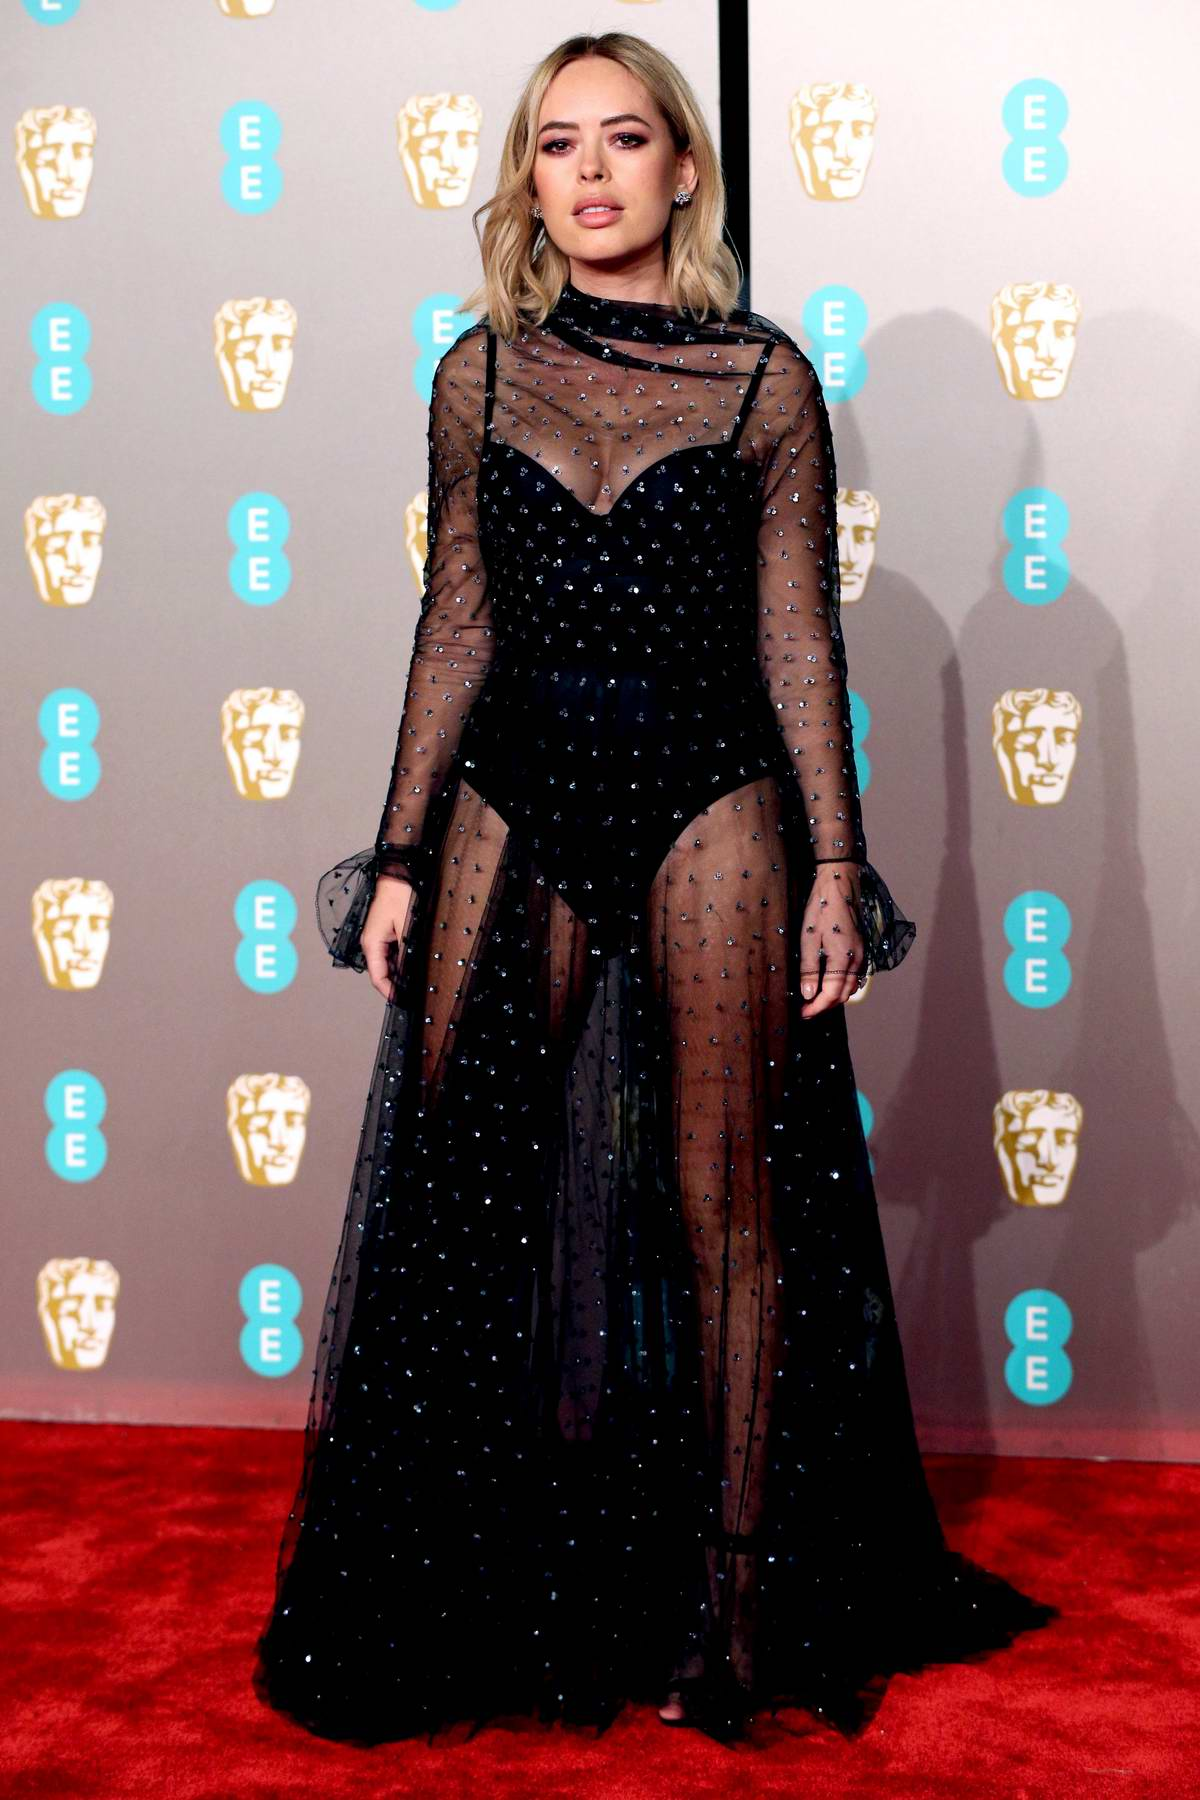 Tanya Burr attends the 72nd EE British Academy Film Awards (BAFTA 2019) at Royal Albert Hall in London, UK